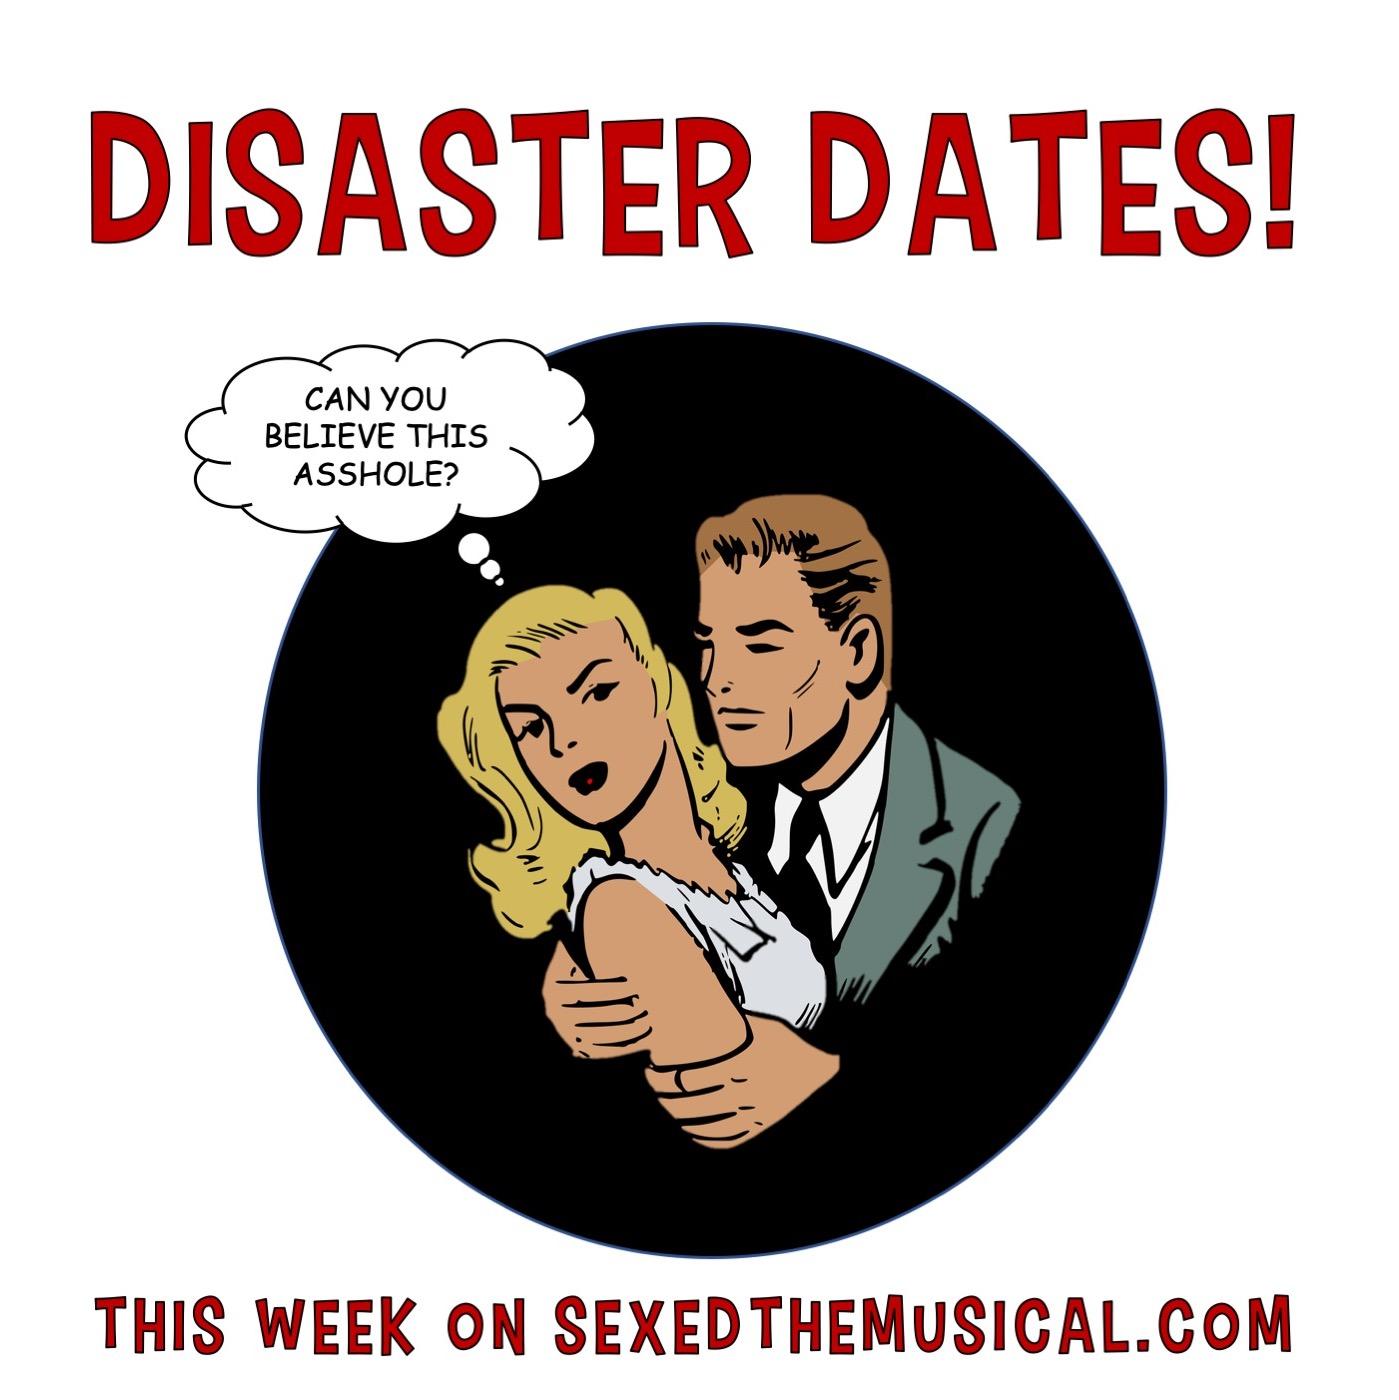 DISASTER DATES!